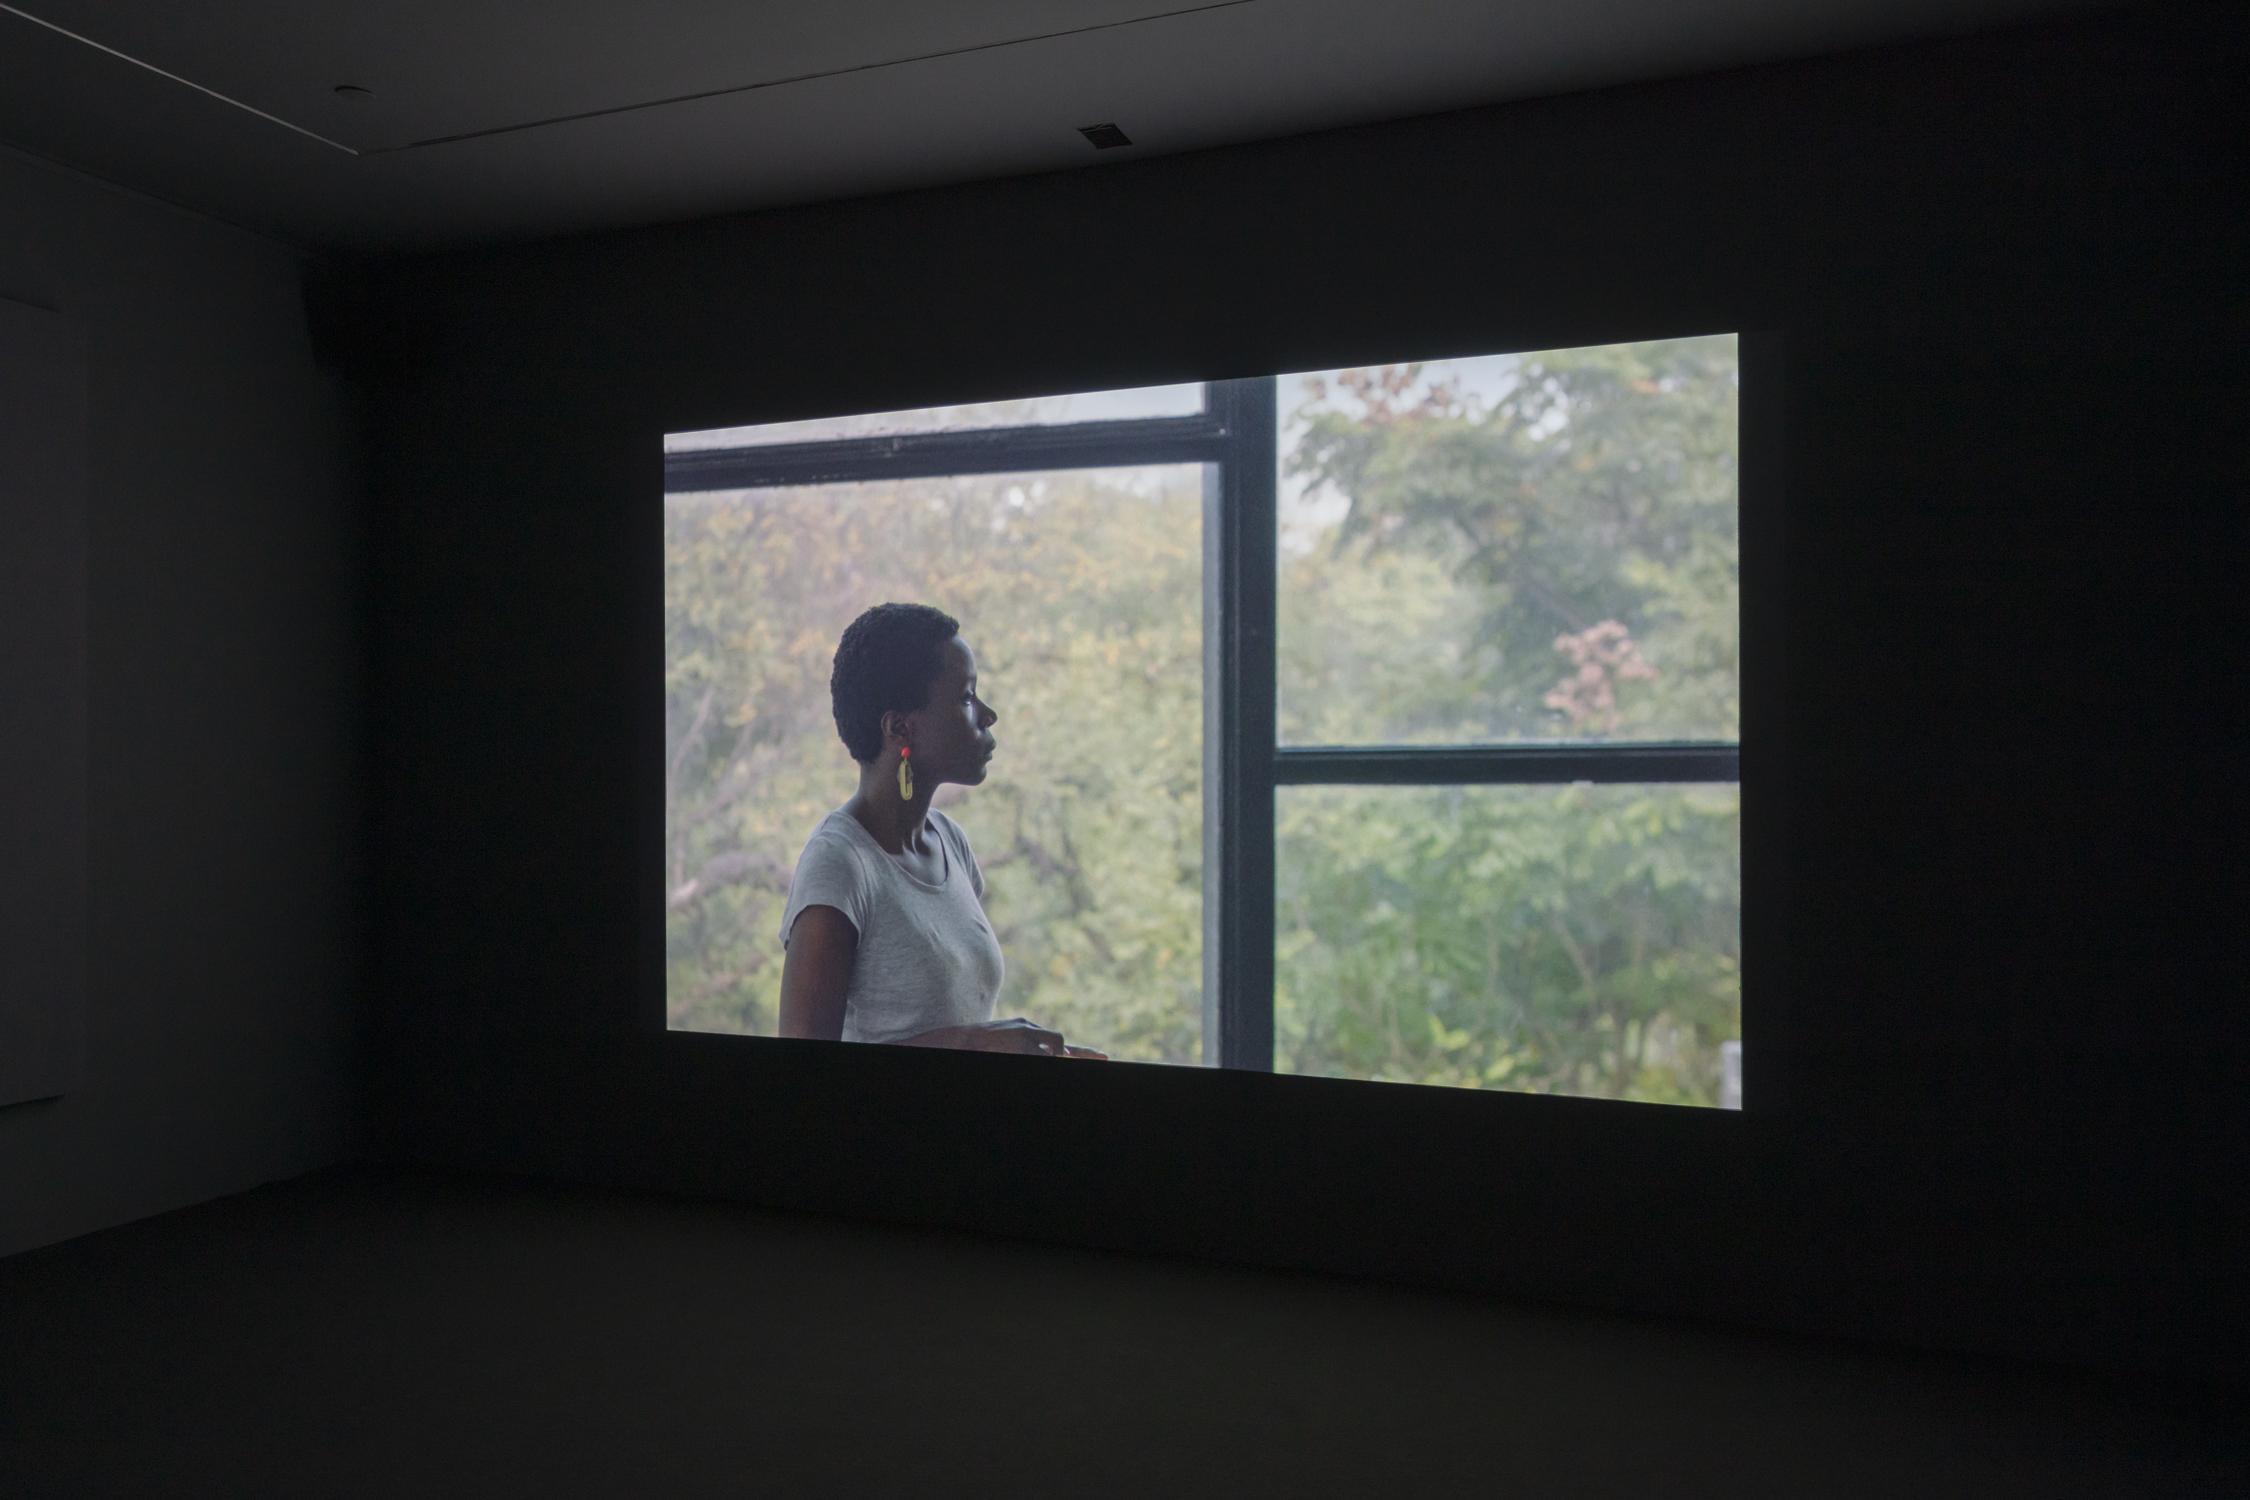 Tamar Guimarães, O Ensaio [The Rehearsal]  2018, video, dimensions variable [still]